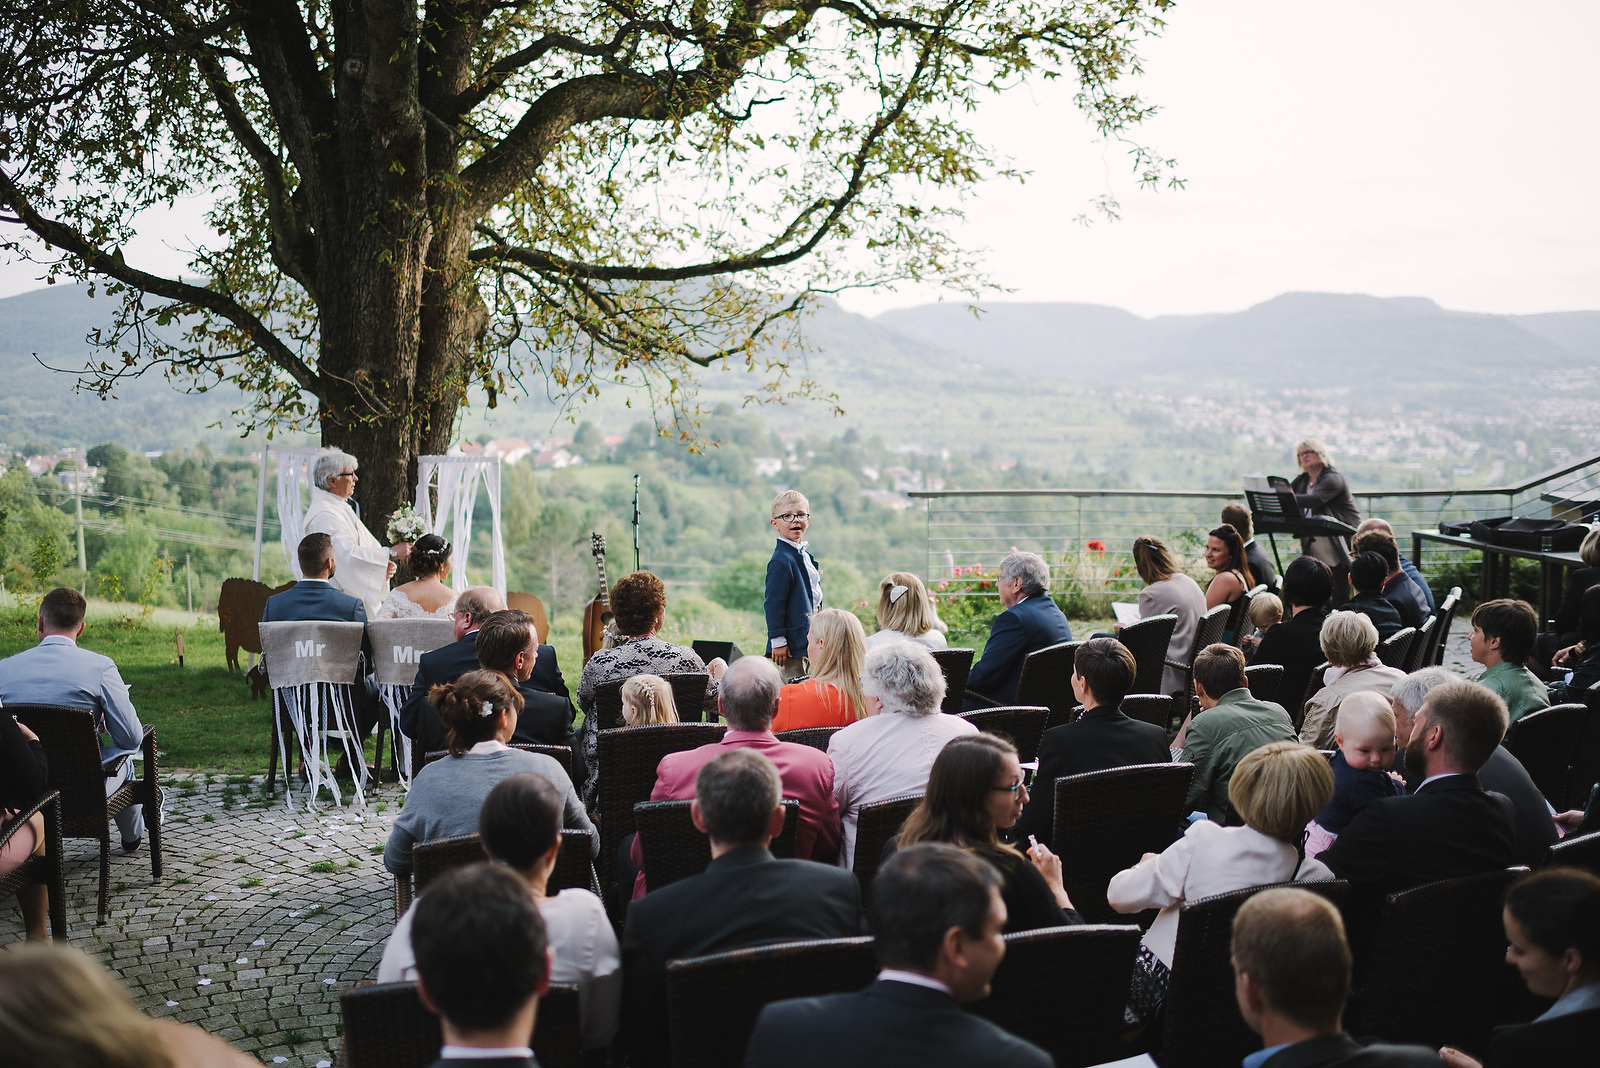 Fotograf Konstanz - Hochzeitsfotograf Reutlingen Achalm Hochzeit EFP 61 - Als Hochzeitsfotograf auf der Achalm, Reutlingen  - 49 -